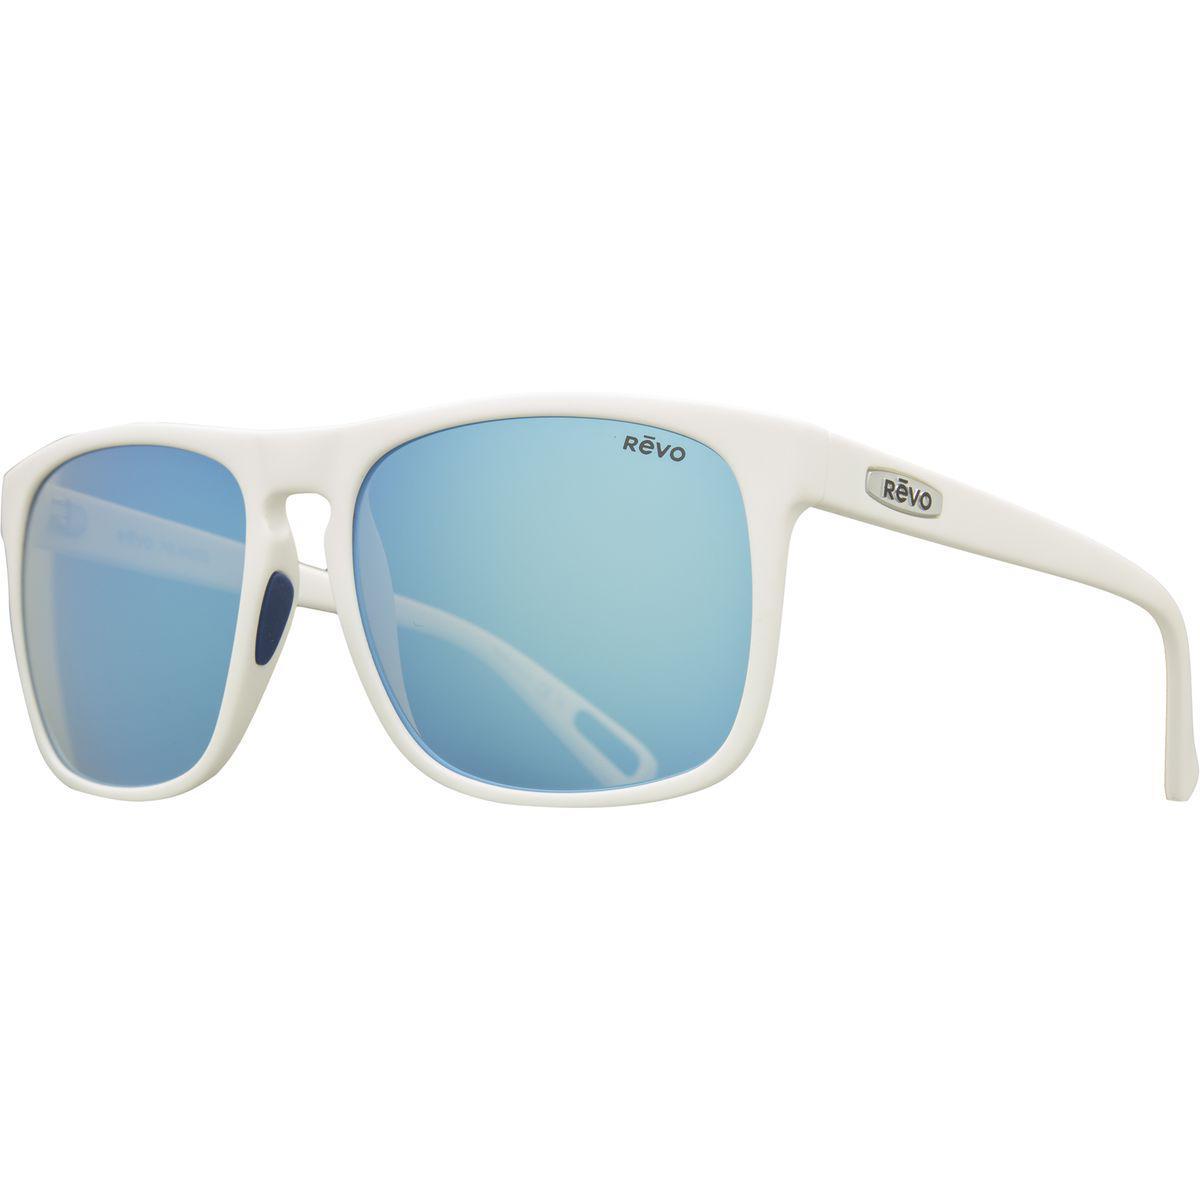 9073cb7ebdd Lyst - Revo Ryker Sunglasses - Polarized in Blue for Men